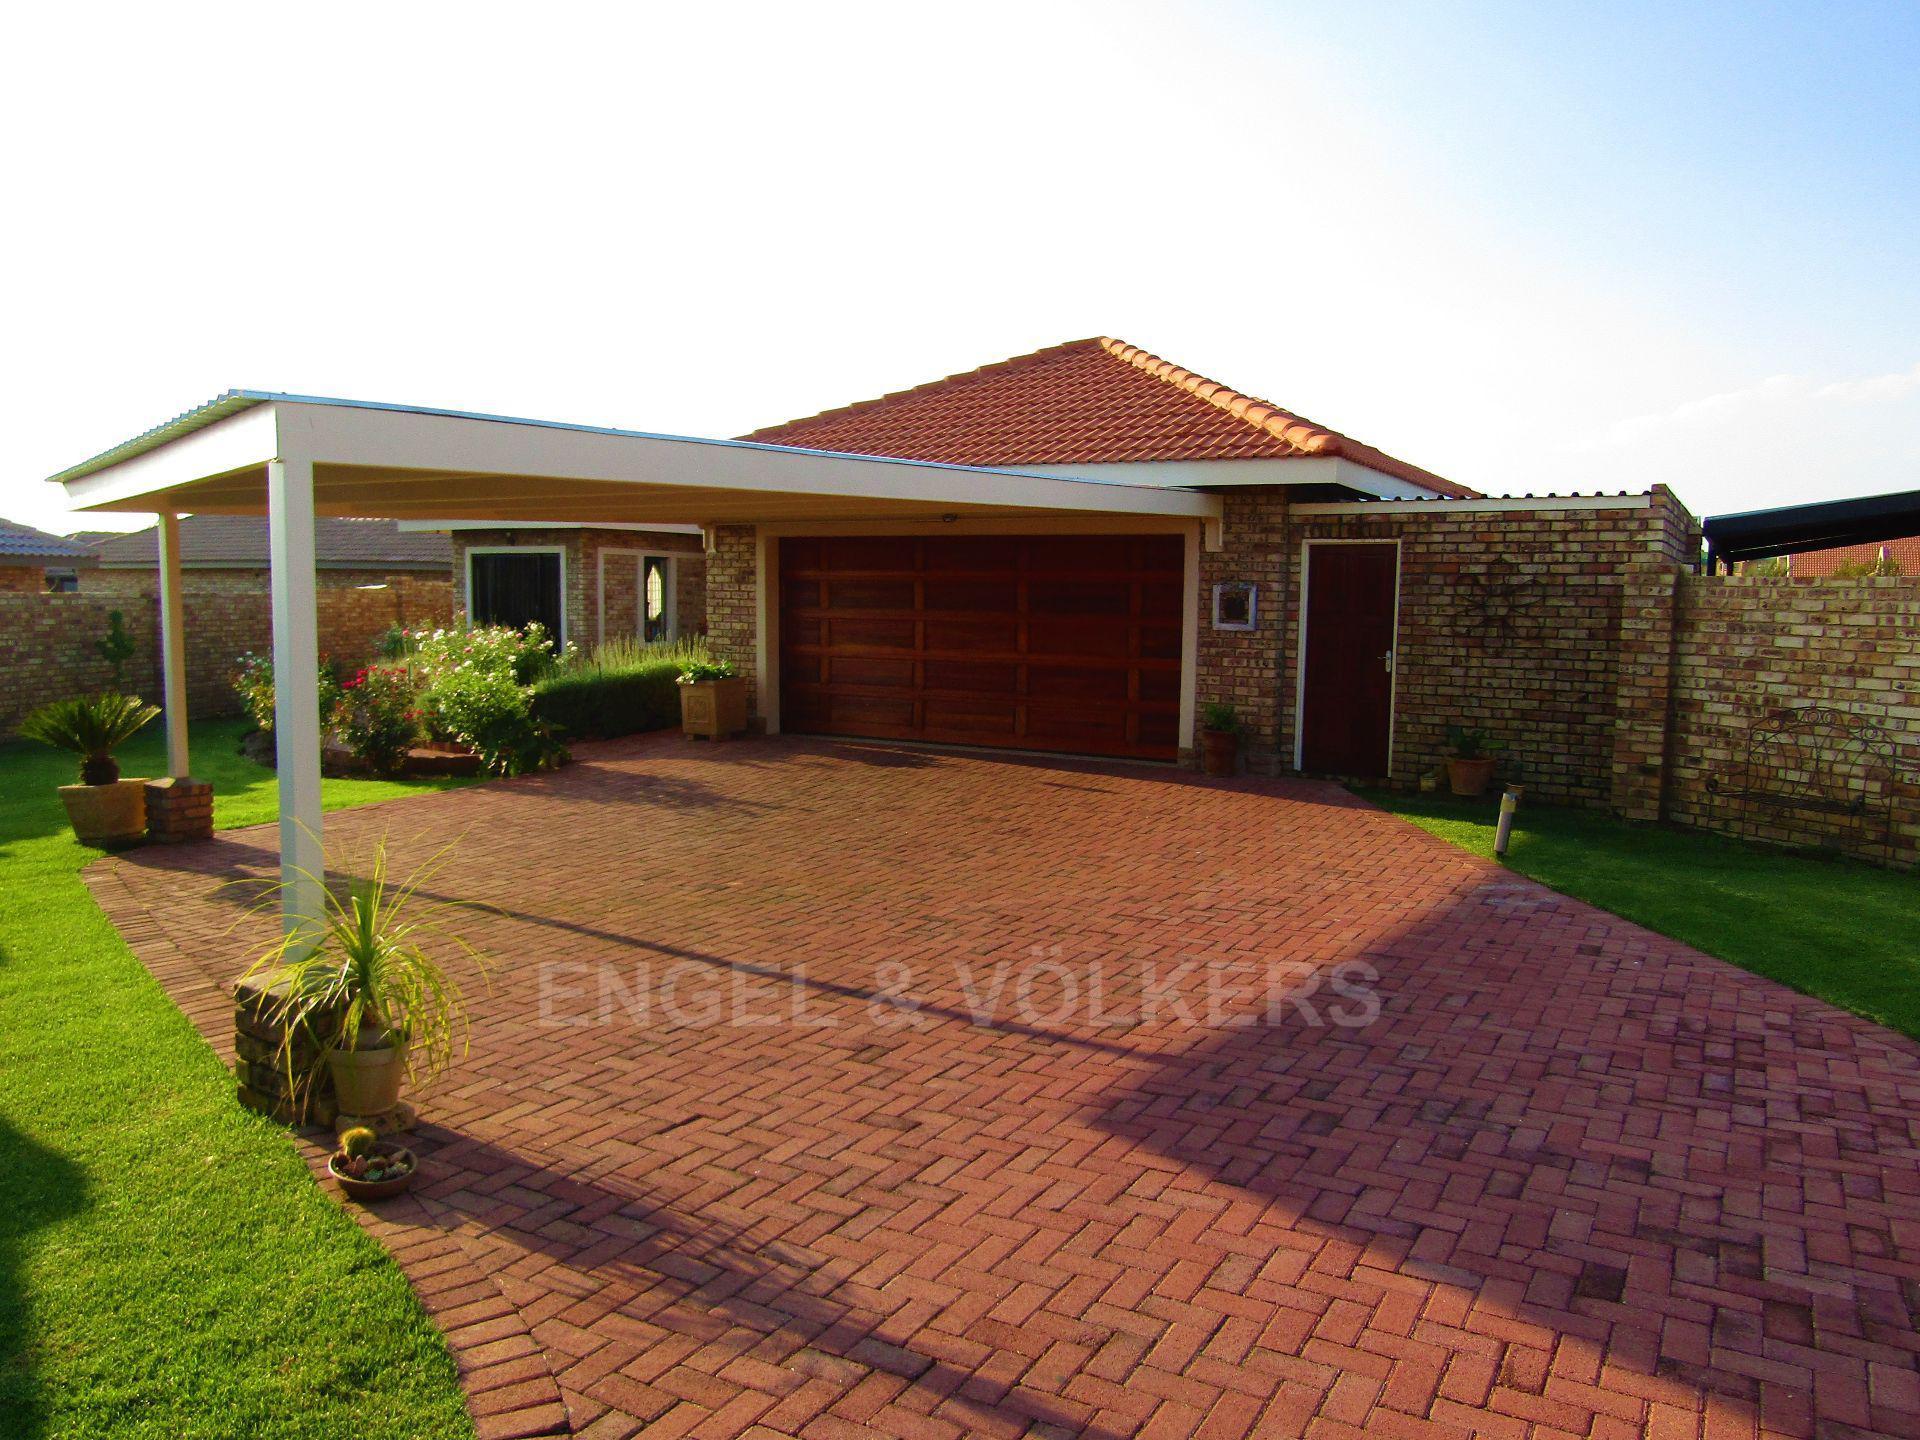 Lifestyle Estate property for sale. Ref No: 13458759. Picture no 2